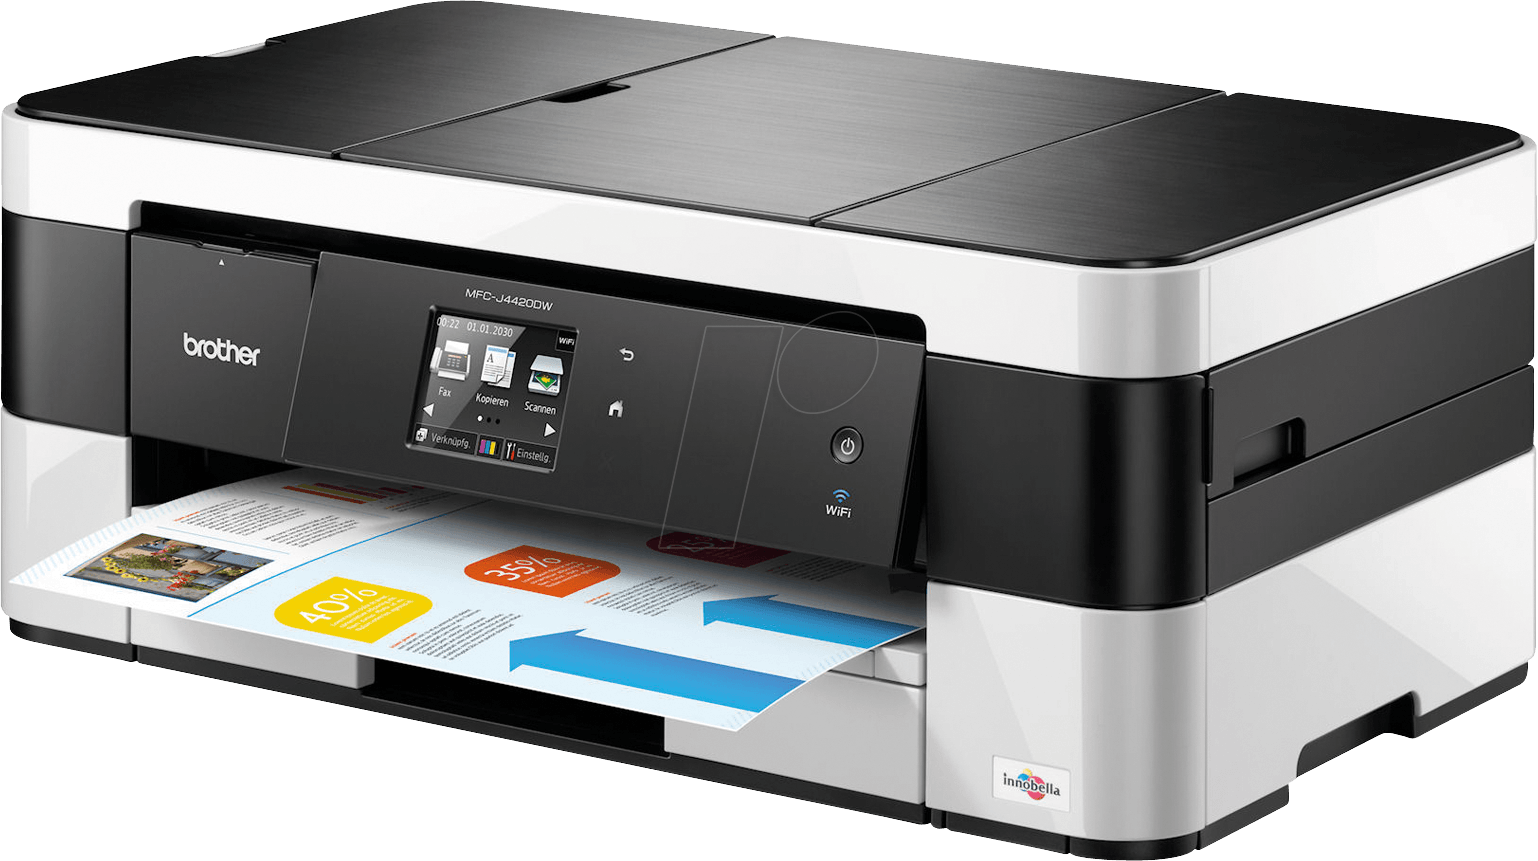 BRO MFCJ4420DW All In One Printer With Fax Wi Fi Duplex